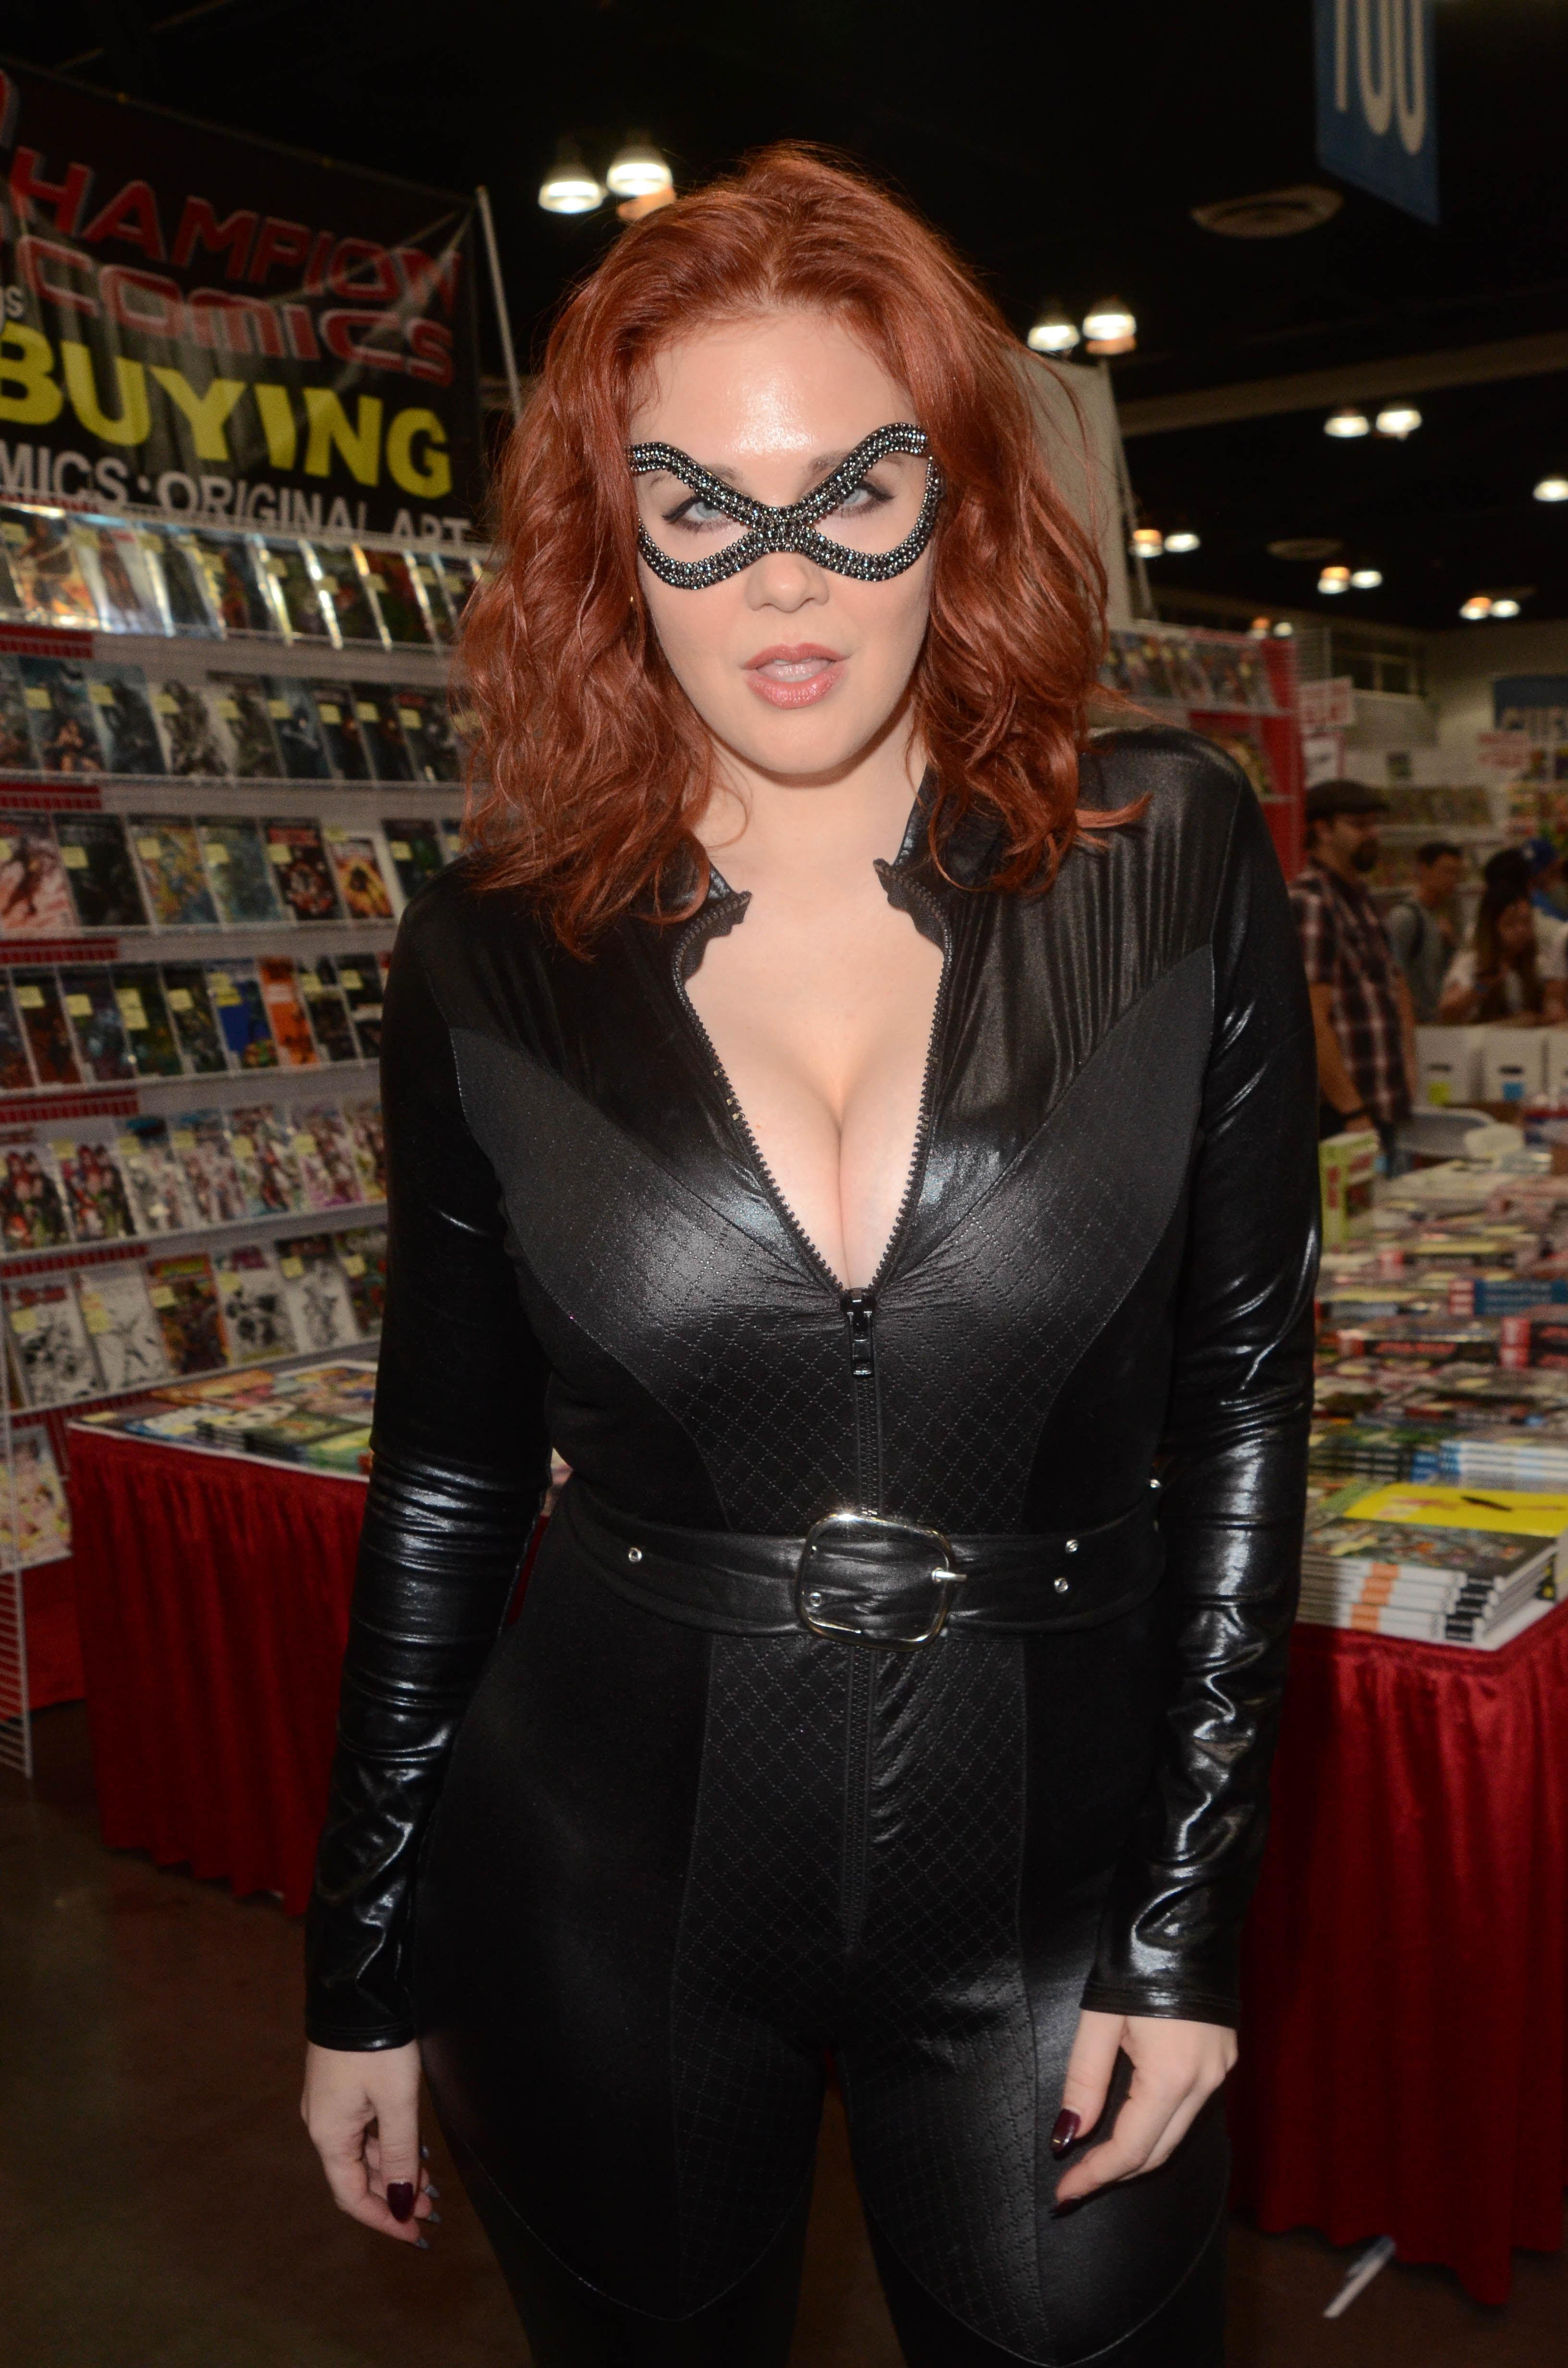 boobs signed 2018 Comicon